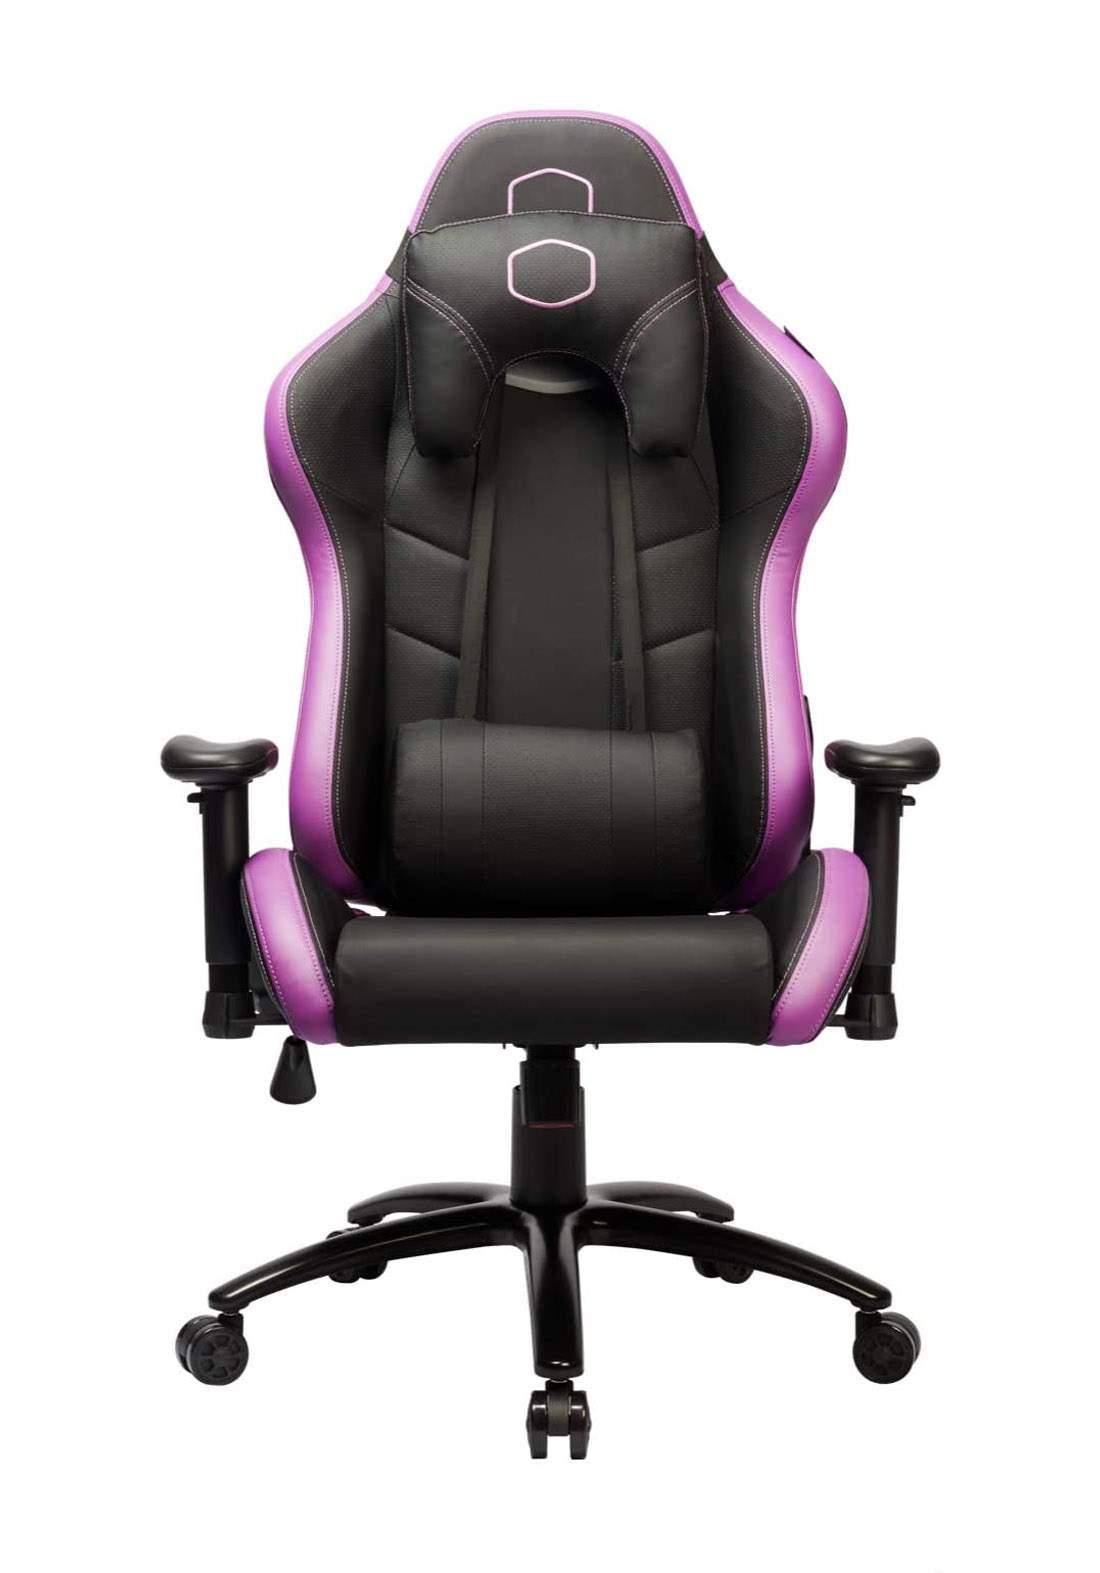 Cooler Master Caliber R2 Gaming Chair - Purple كرسي العاب